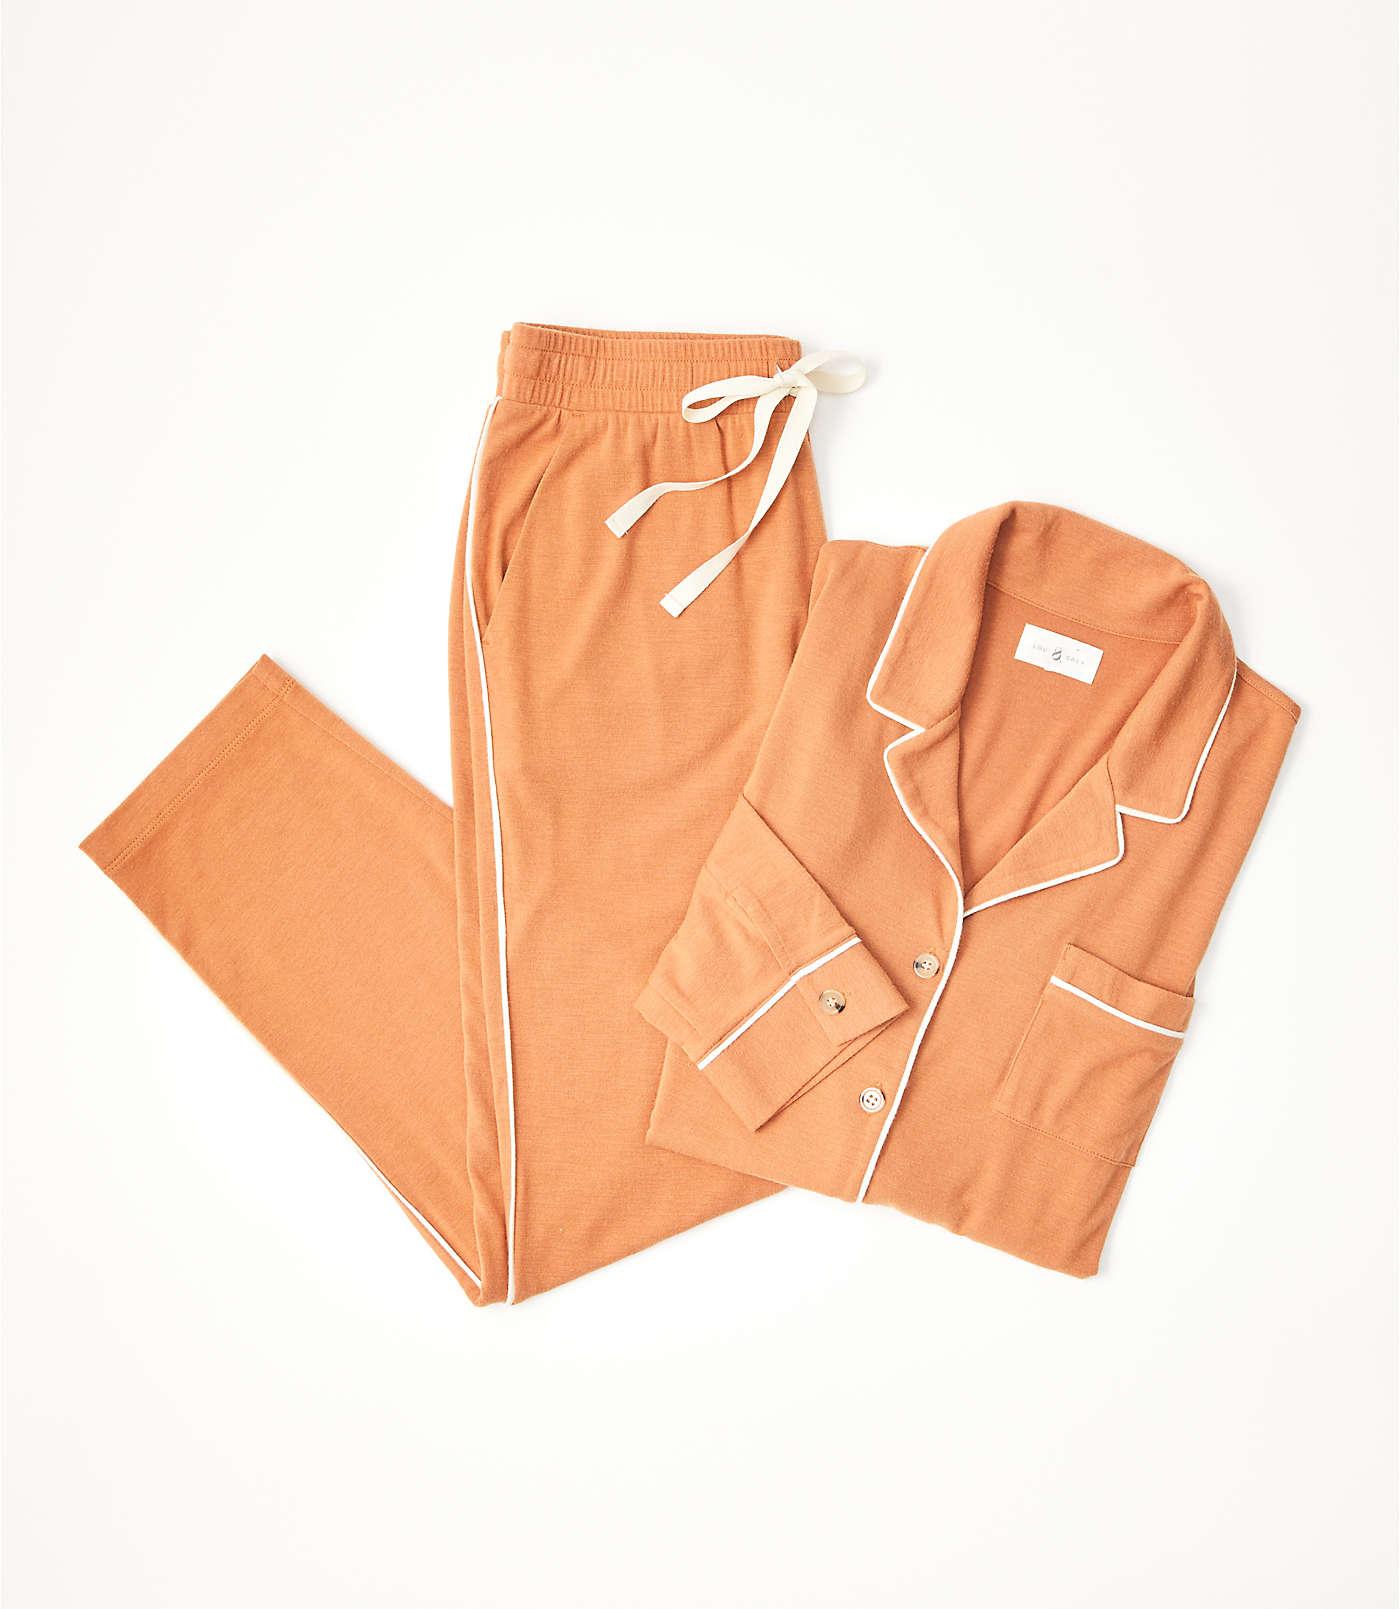 Lou & Grey Softened Jersey Pajama Set